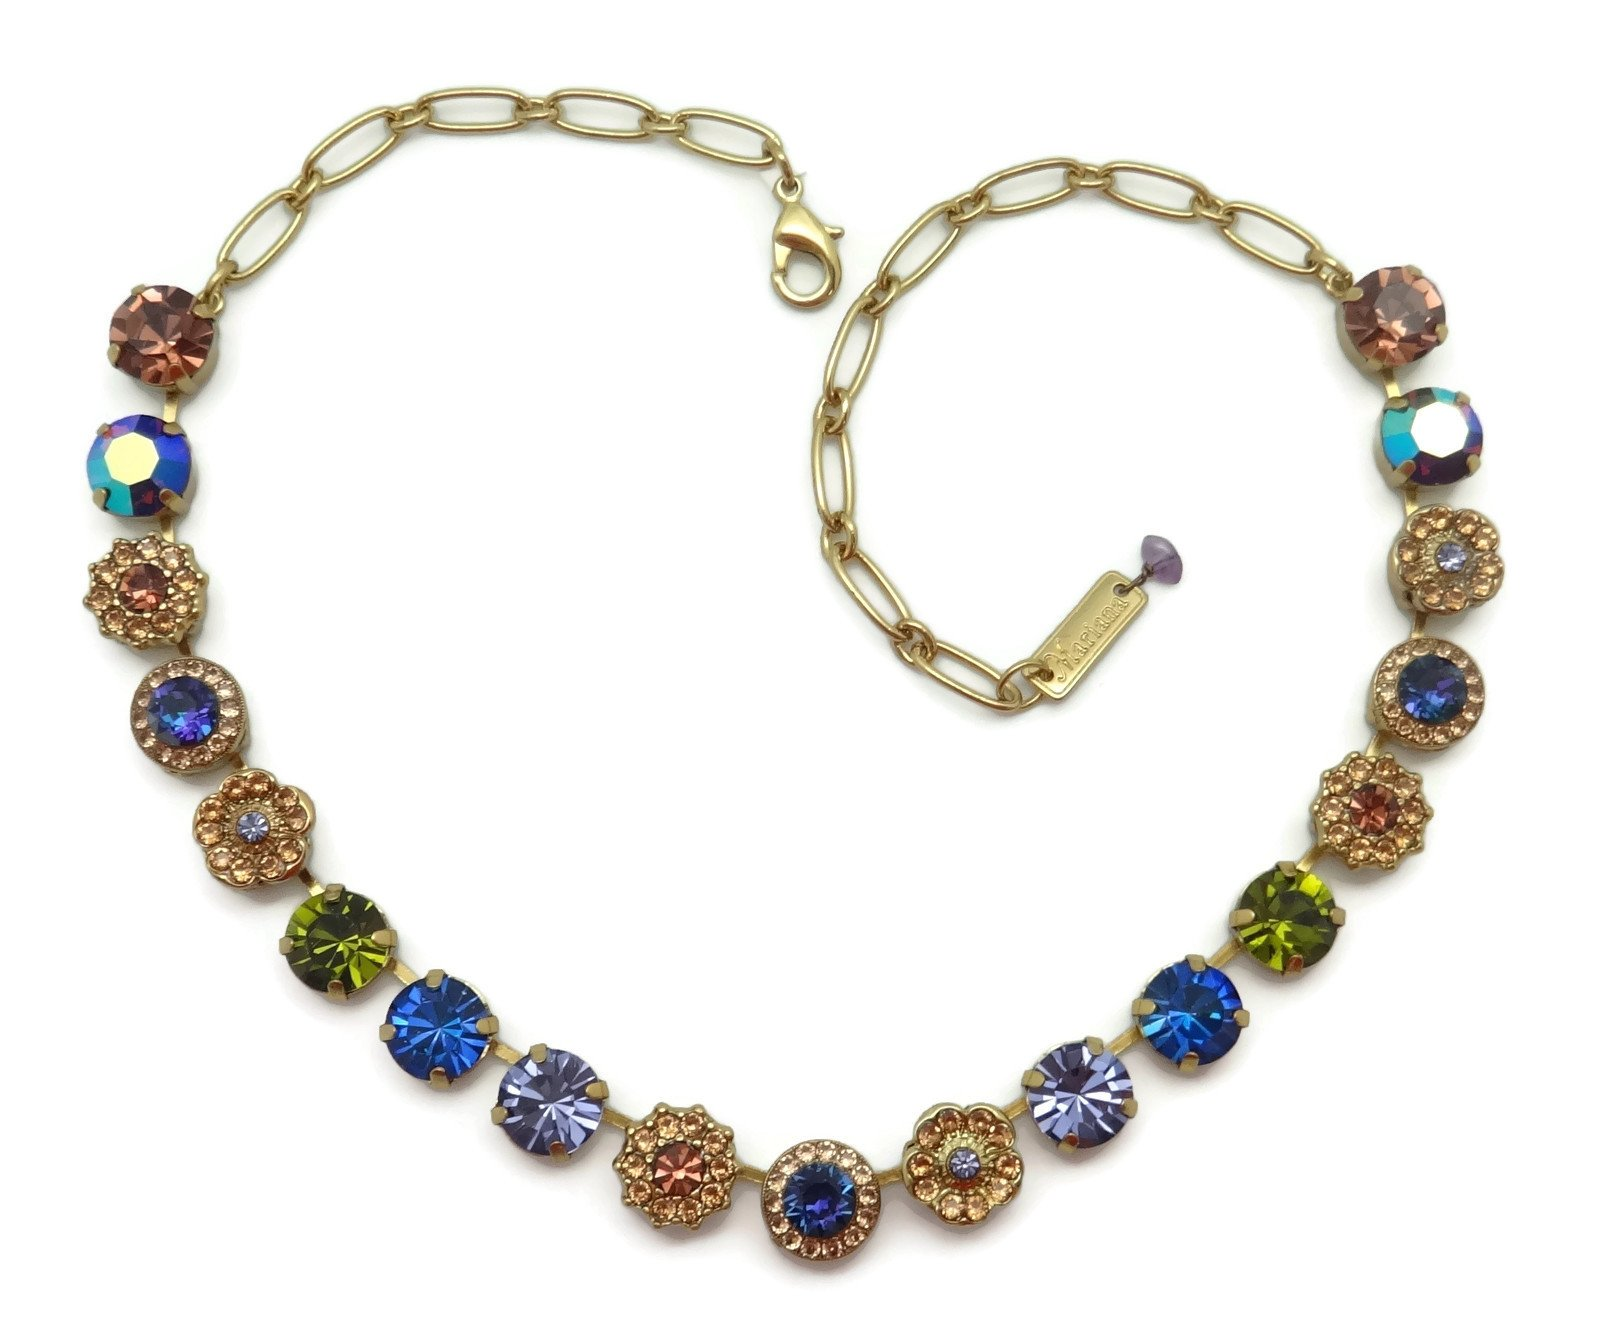 Mariana English Gold Plated Swarovski Crystal Necklace Multi Color Mosaic 1089 Odyssey Penelope by Mariana (Image #3)